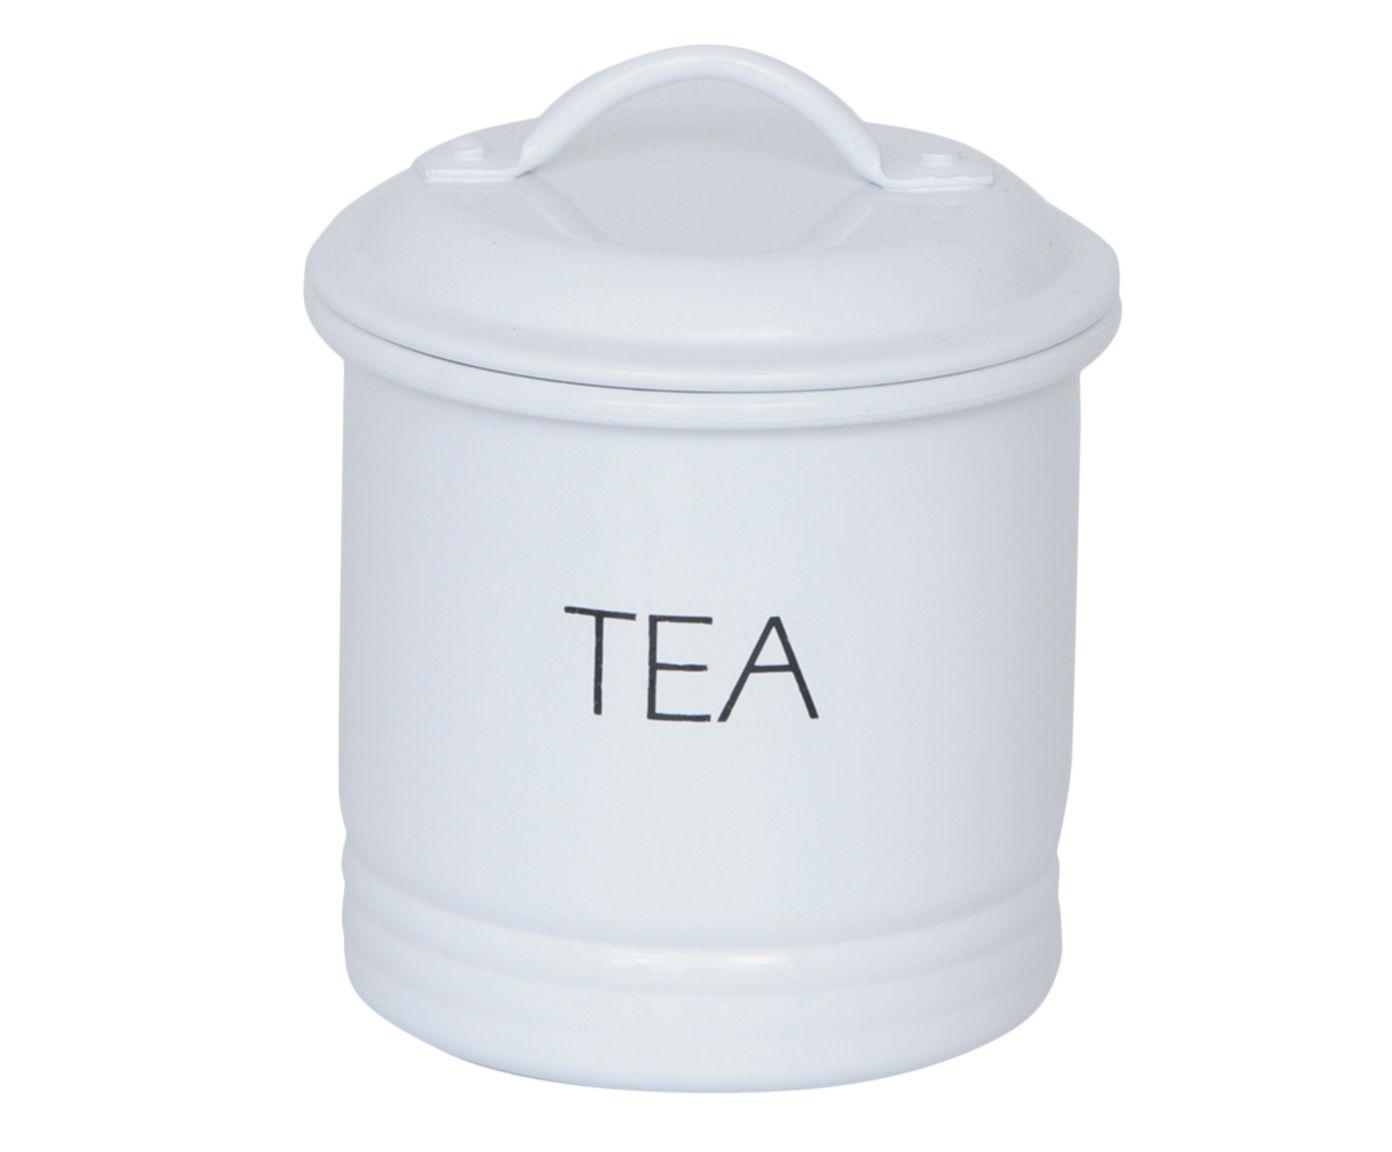 Lata Canelada Tea - Branca | Westwing.com.br